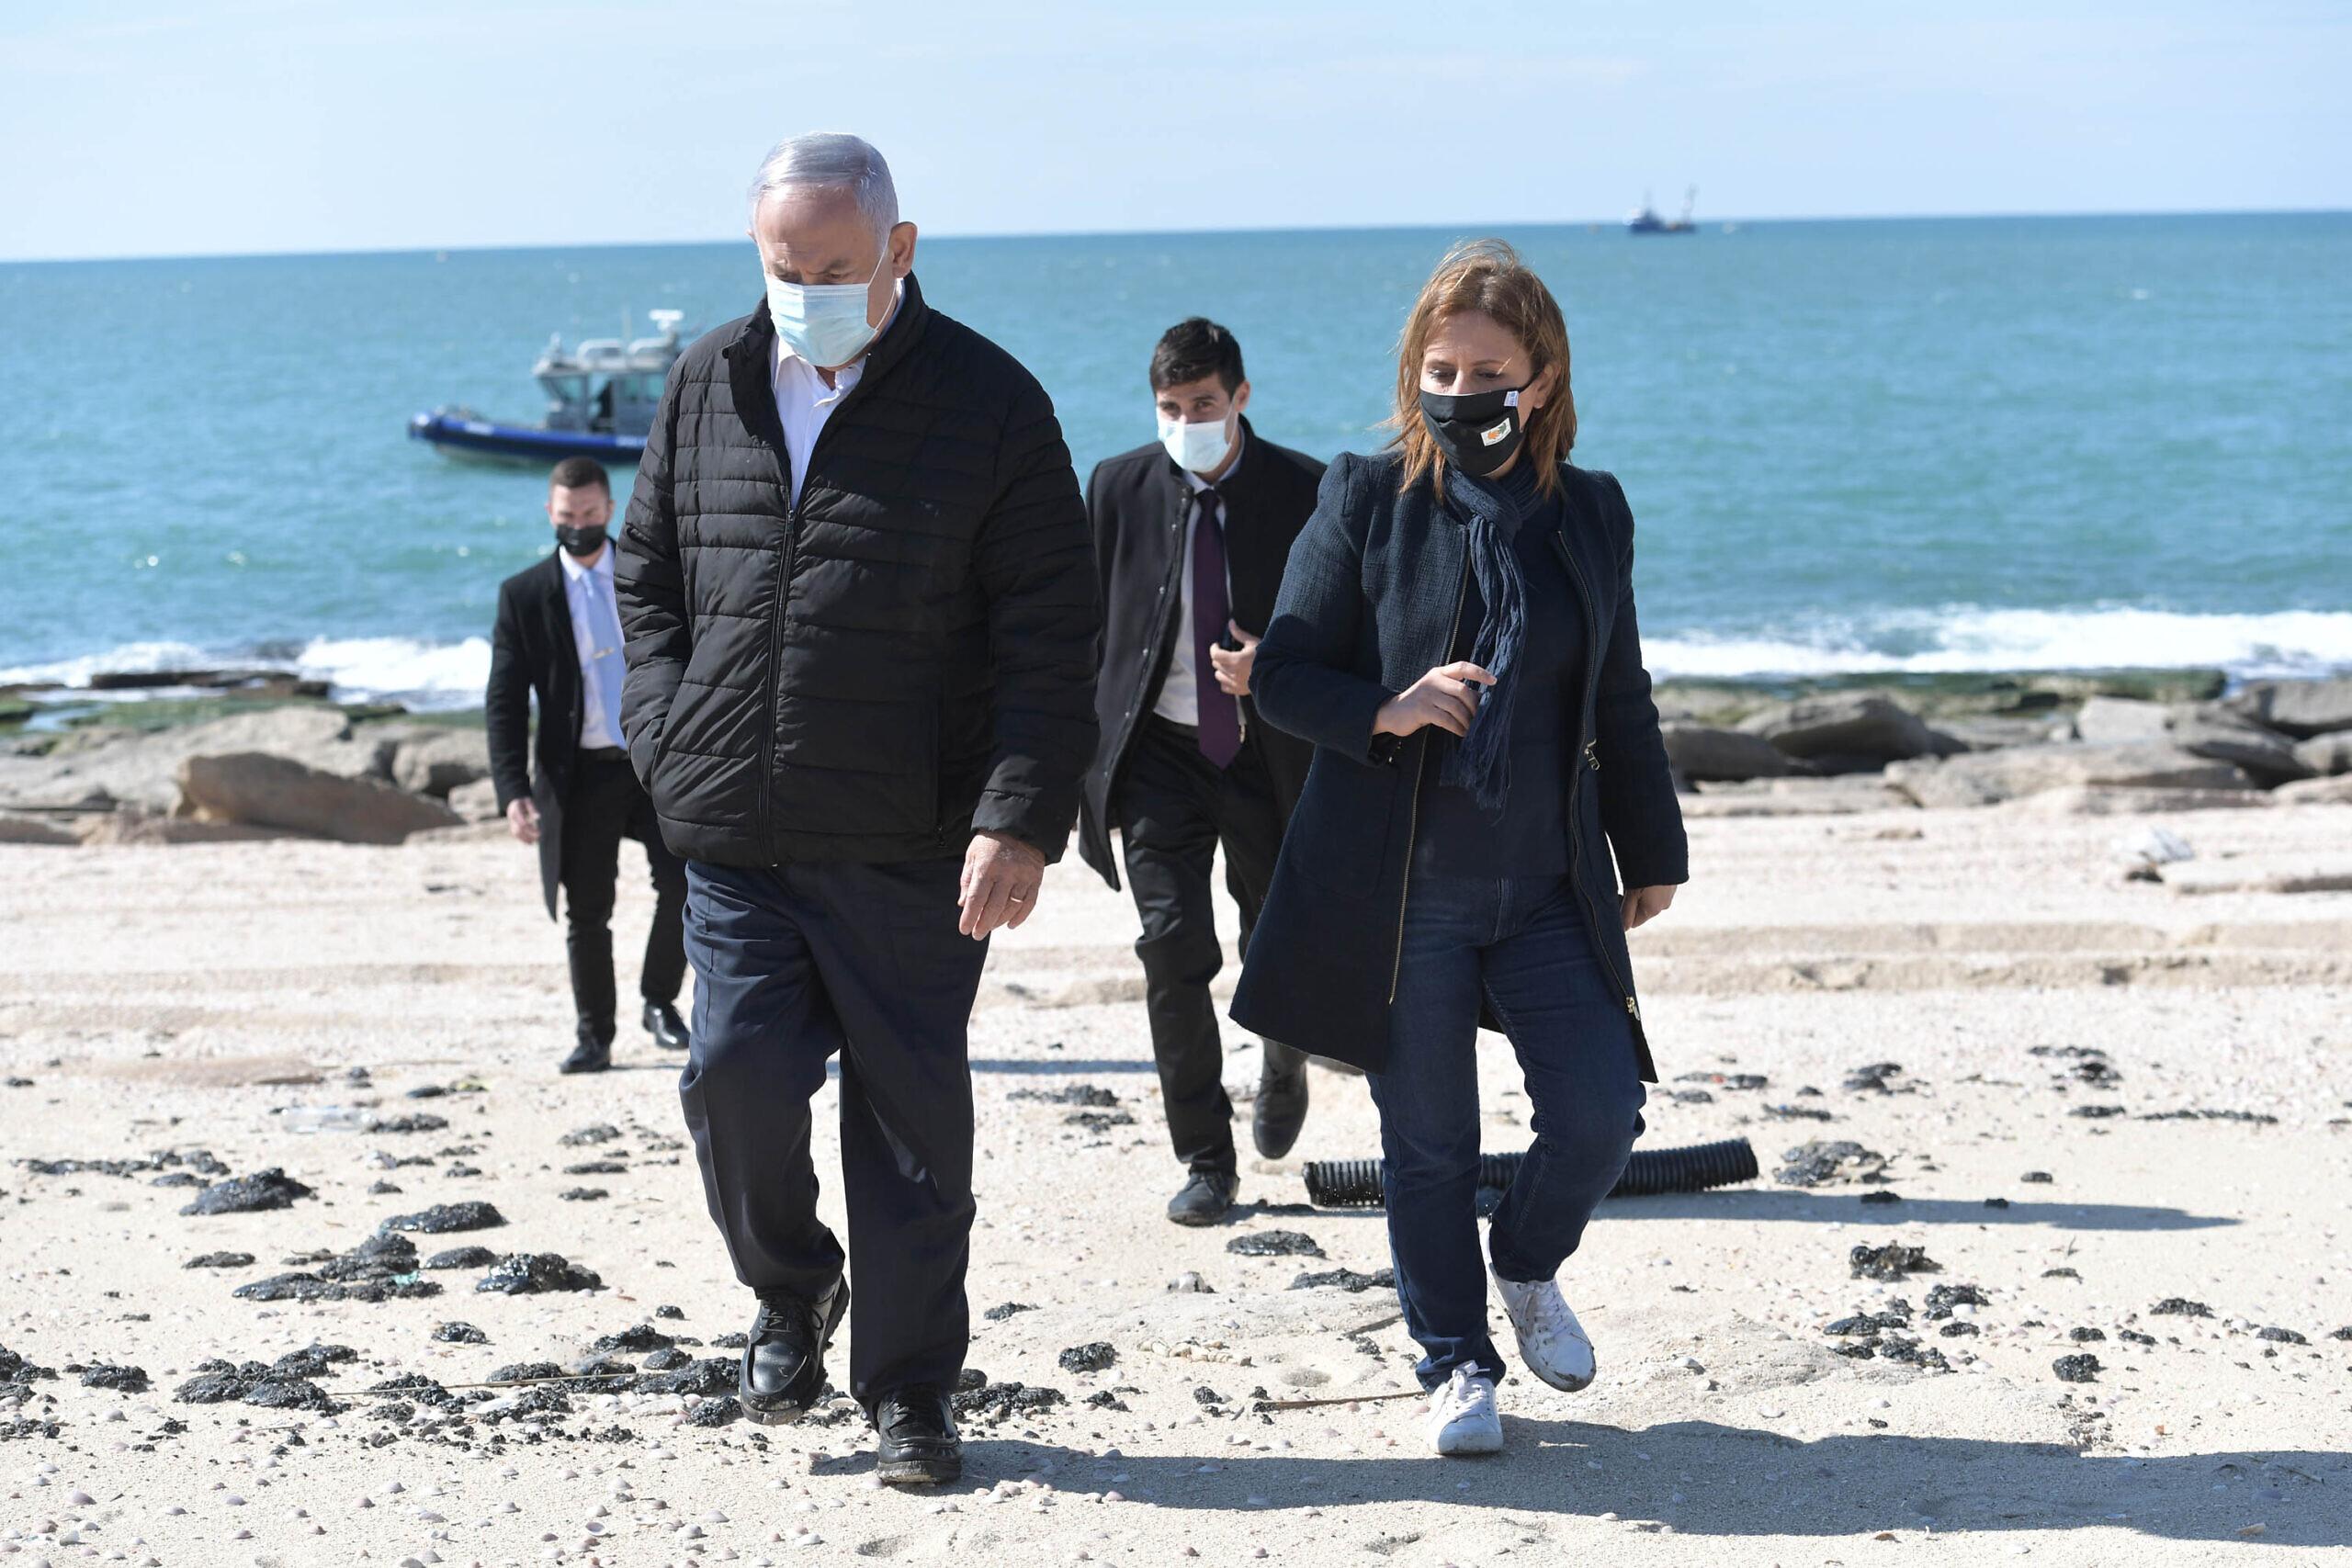 Israel says it has identified ship that caused massive oil leak in Mediterranean